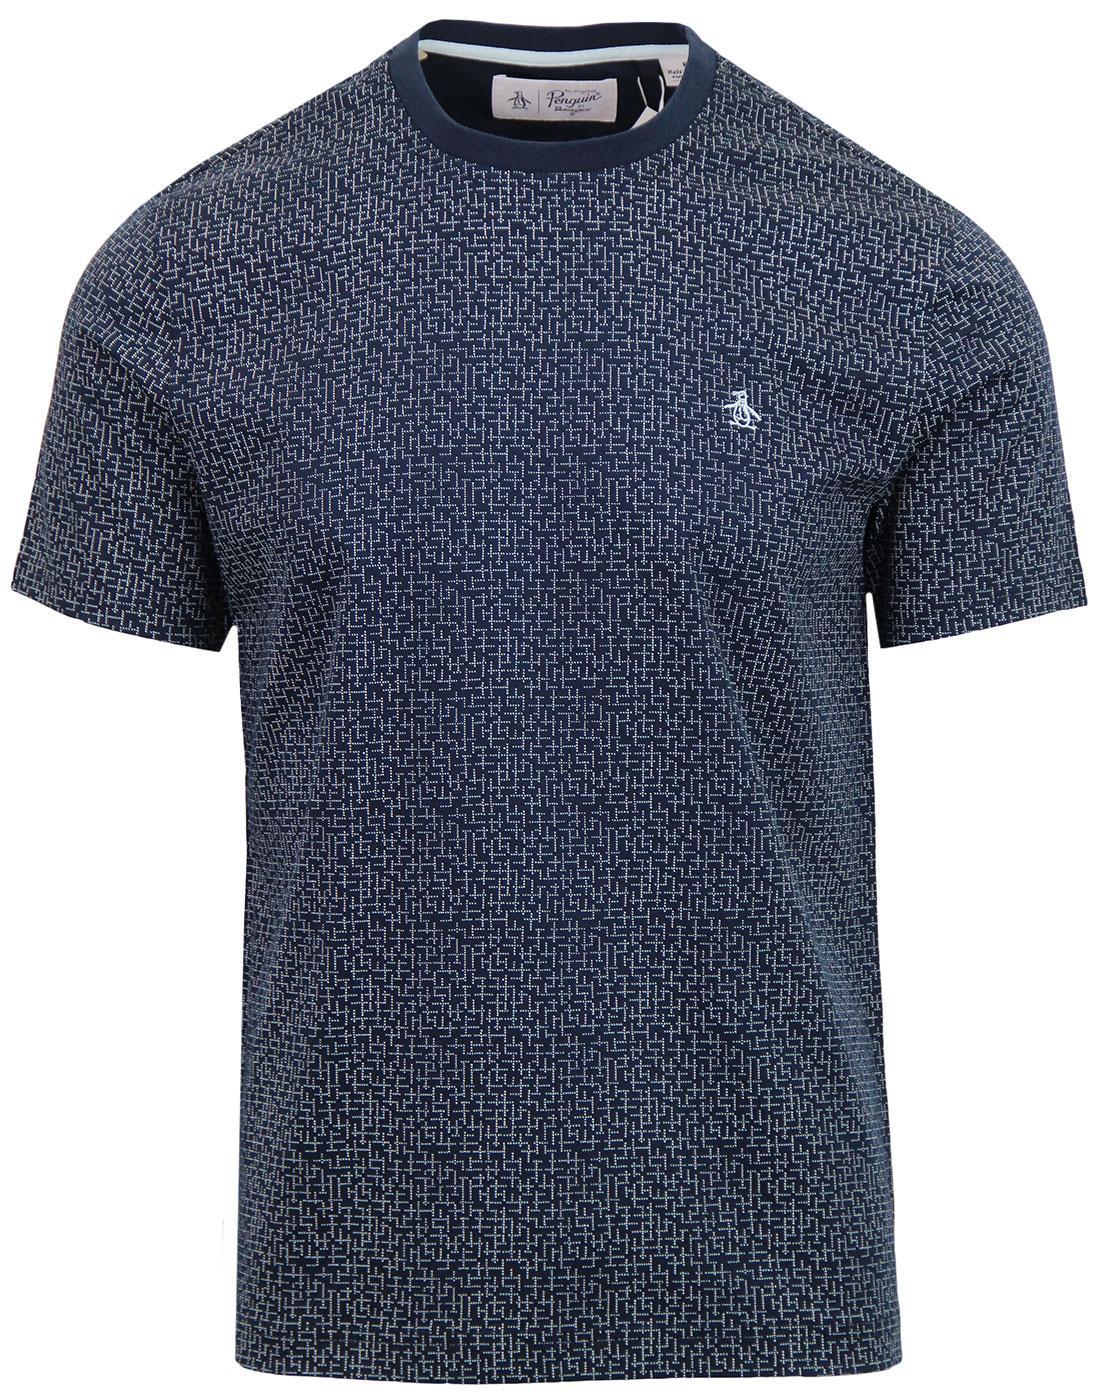 ORIGINAL PENGUIN Retro Abstract Dot Print T-Shirt